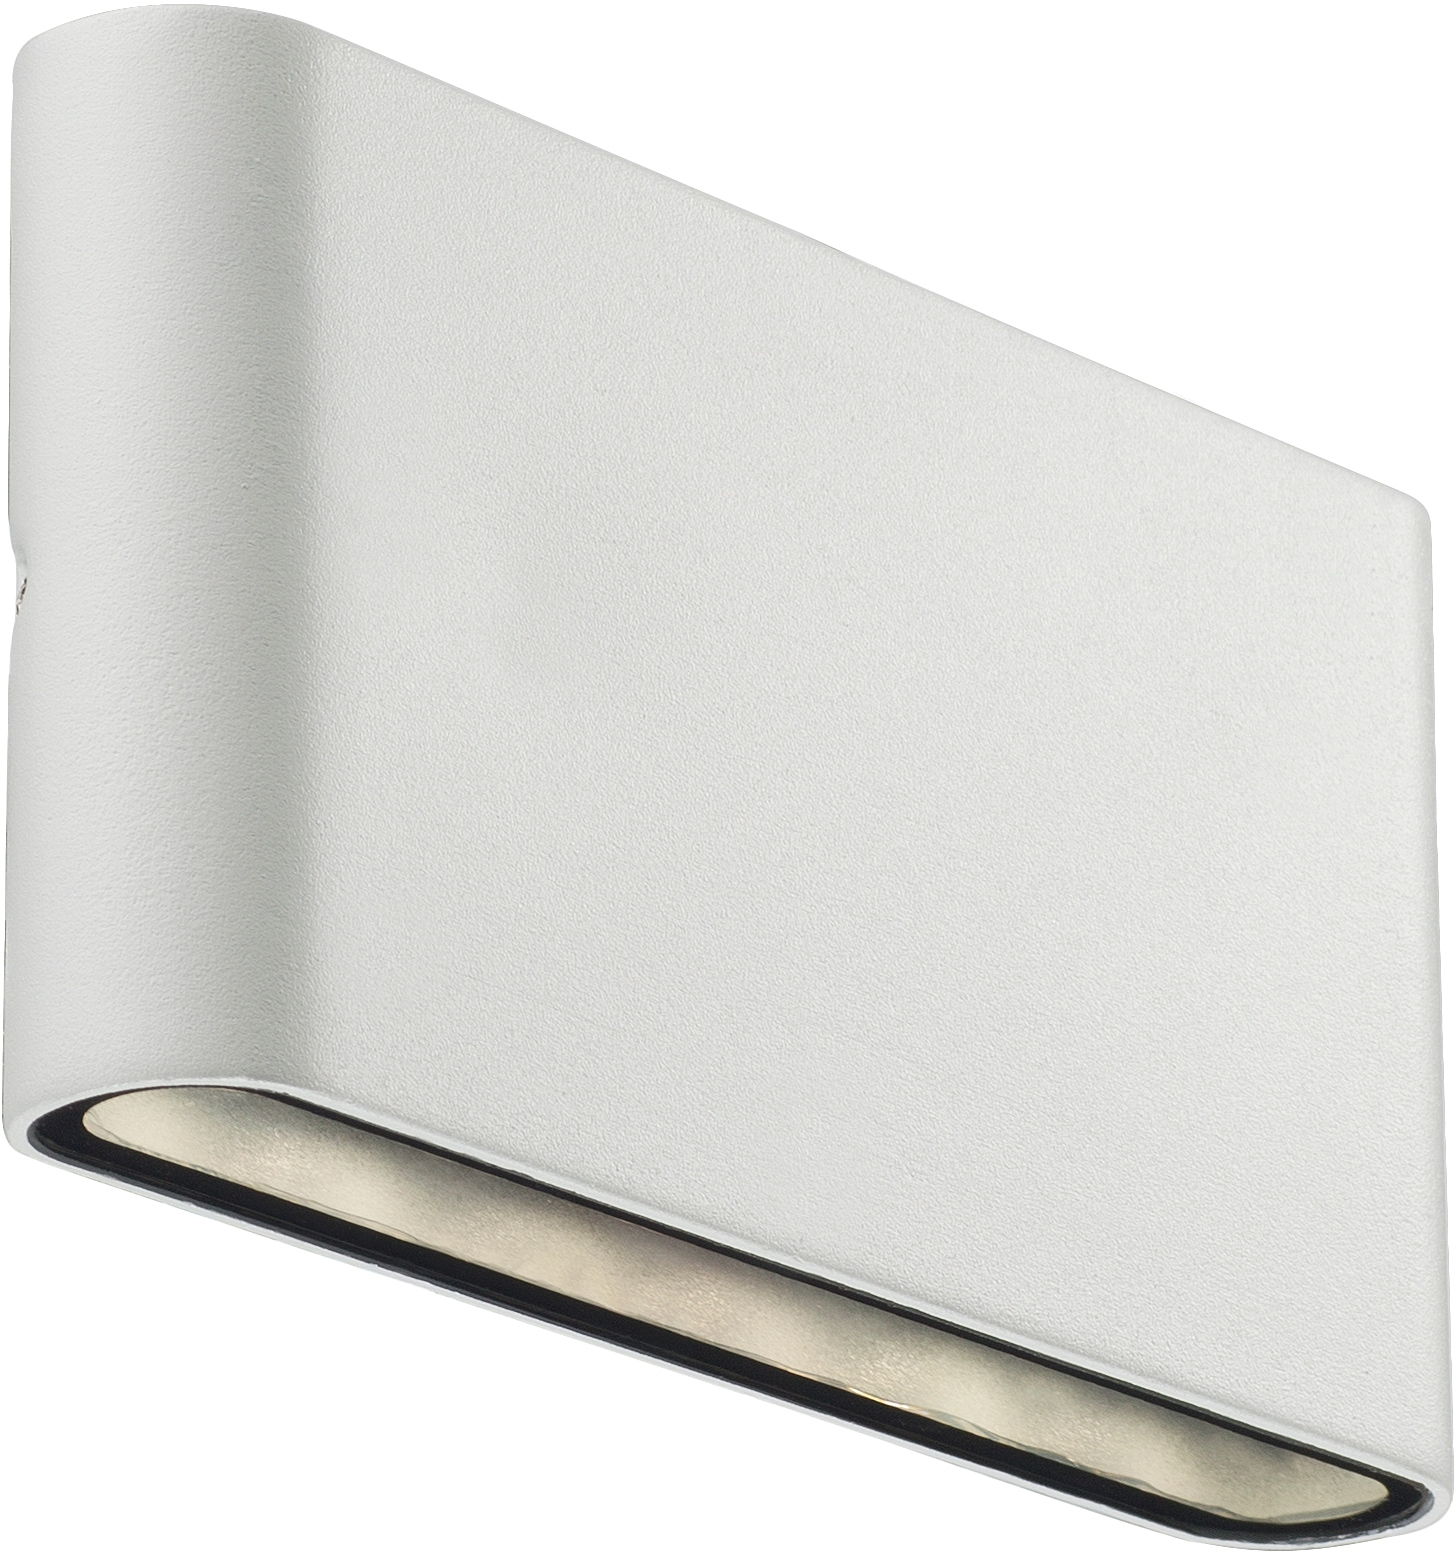 Nordlux LED Außen-Wandleuchte Kinver, LED-Board, Warmweiß